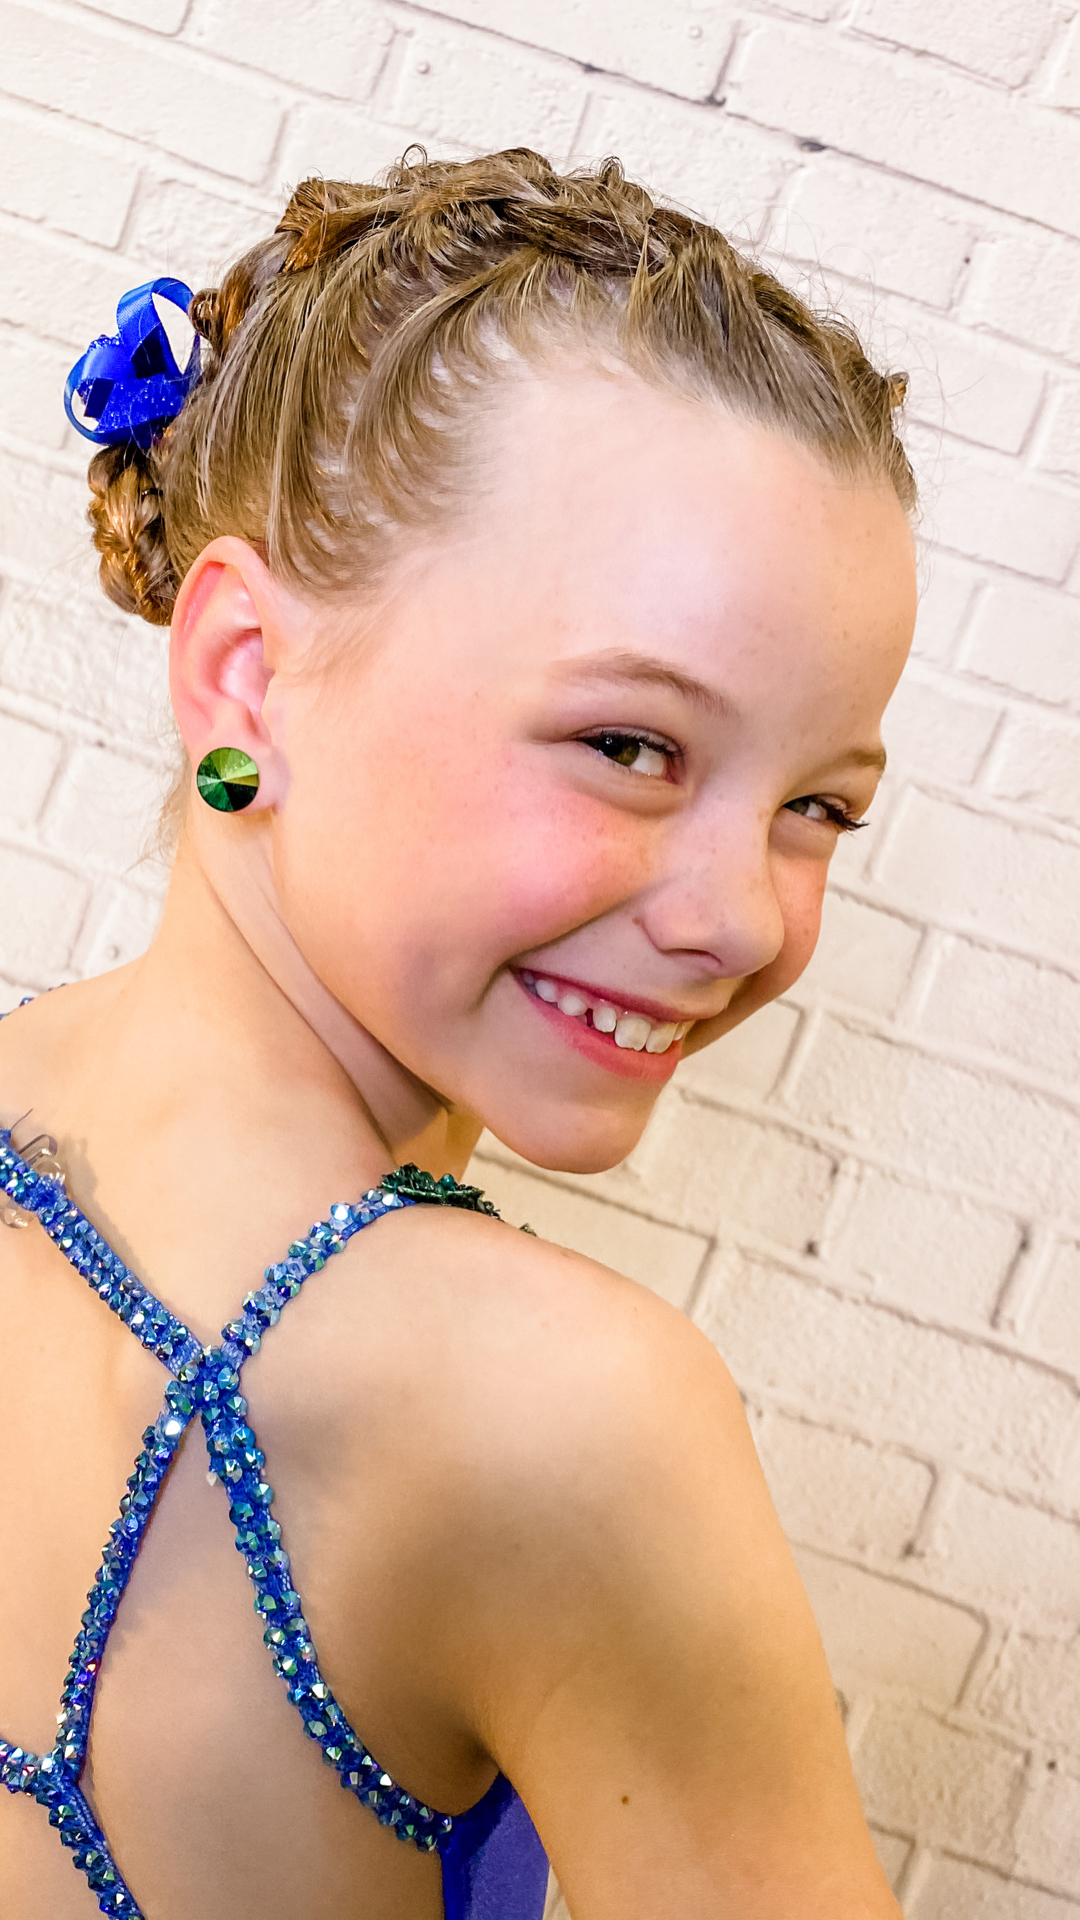 World of Dance Season 4 Contestant - Savannah Manzel